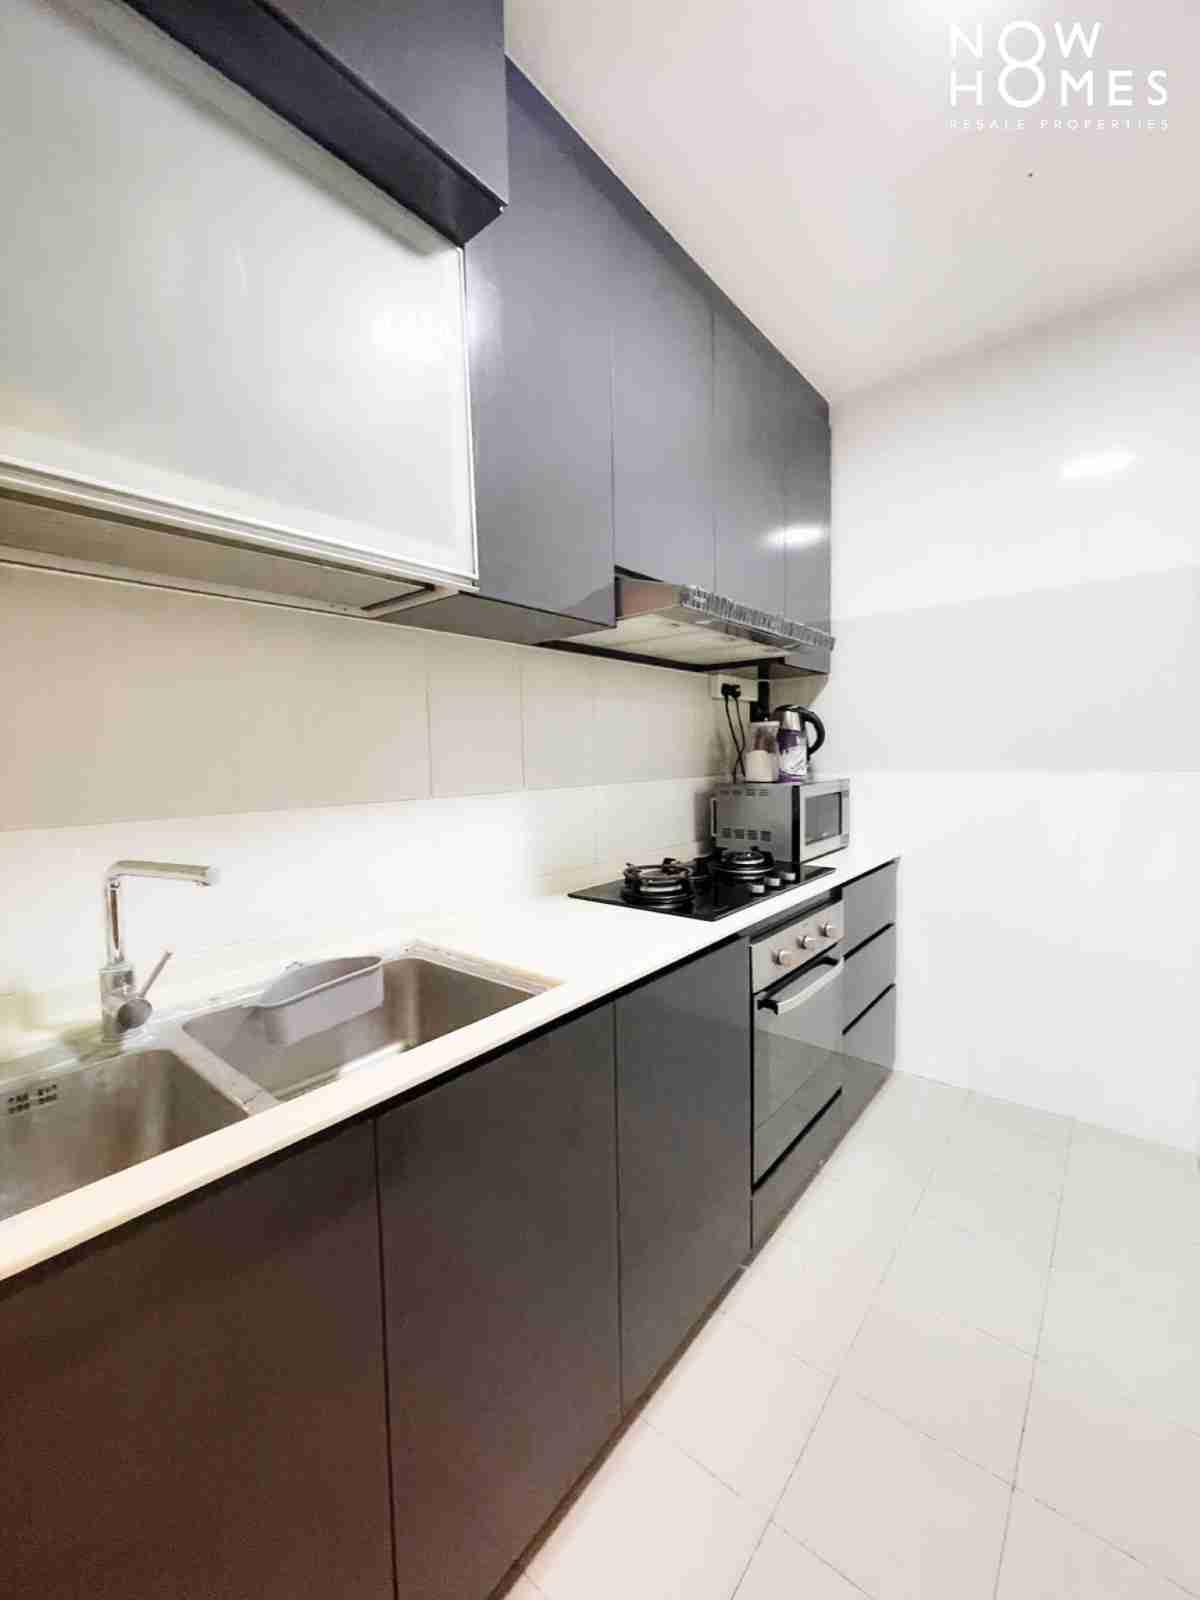 punggol resale property - 215a - Gray Kitchen full view